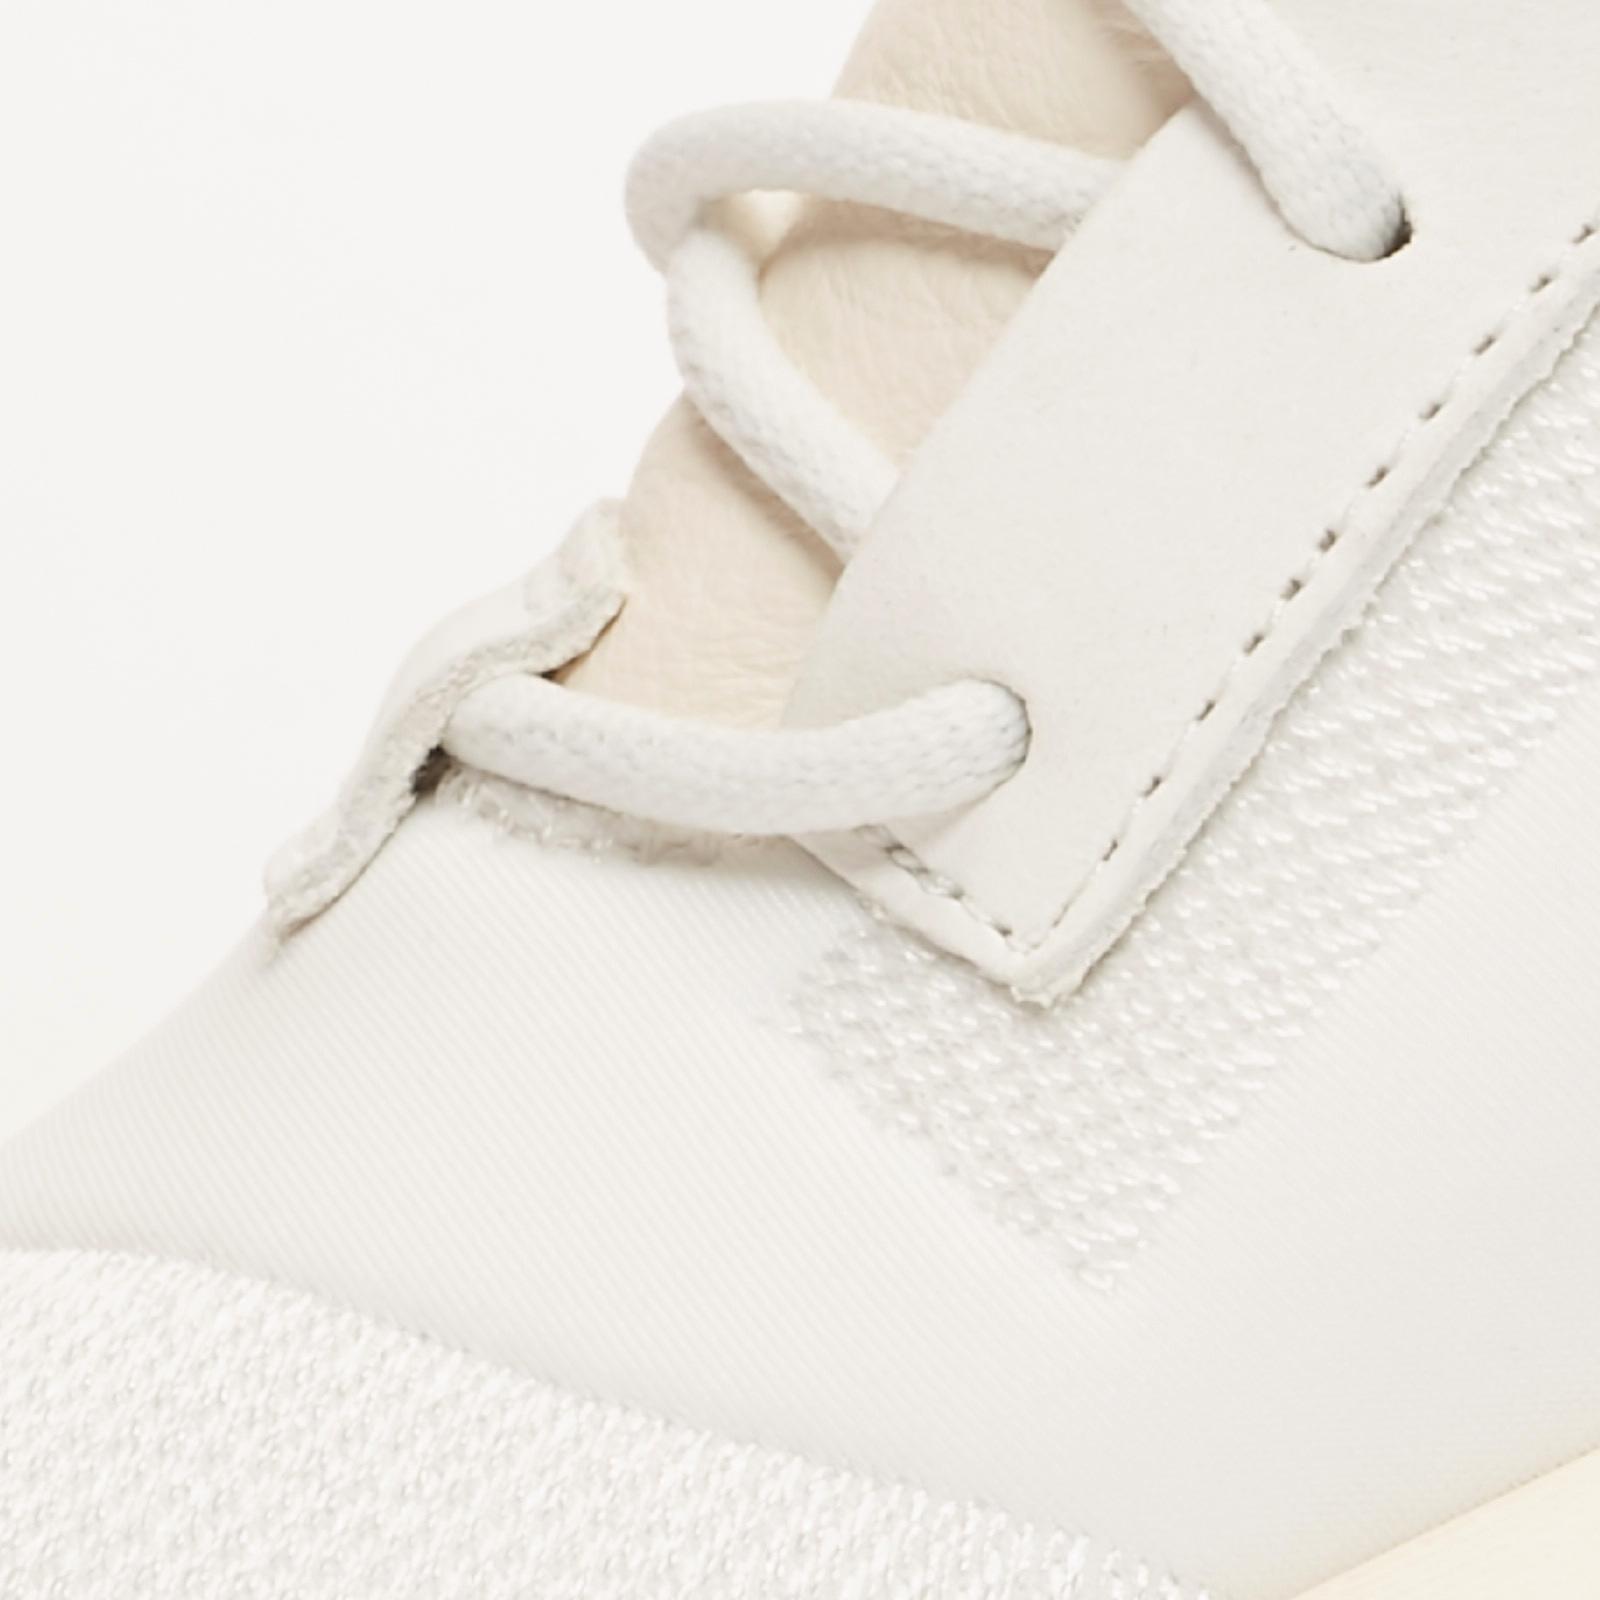 size 40 e5163 fa42d ... adidas Consortium POD S3.1 x Slam Jam ...